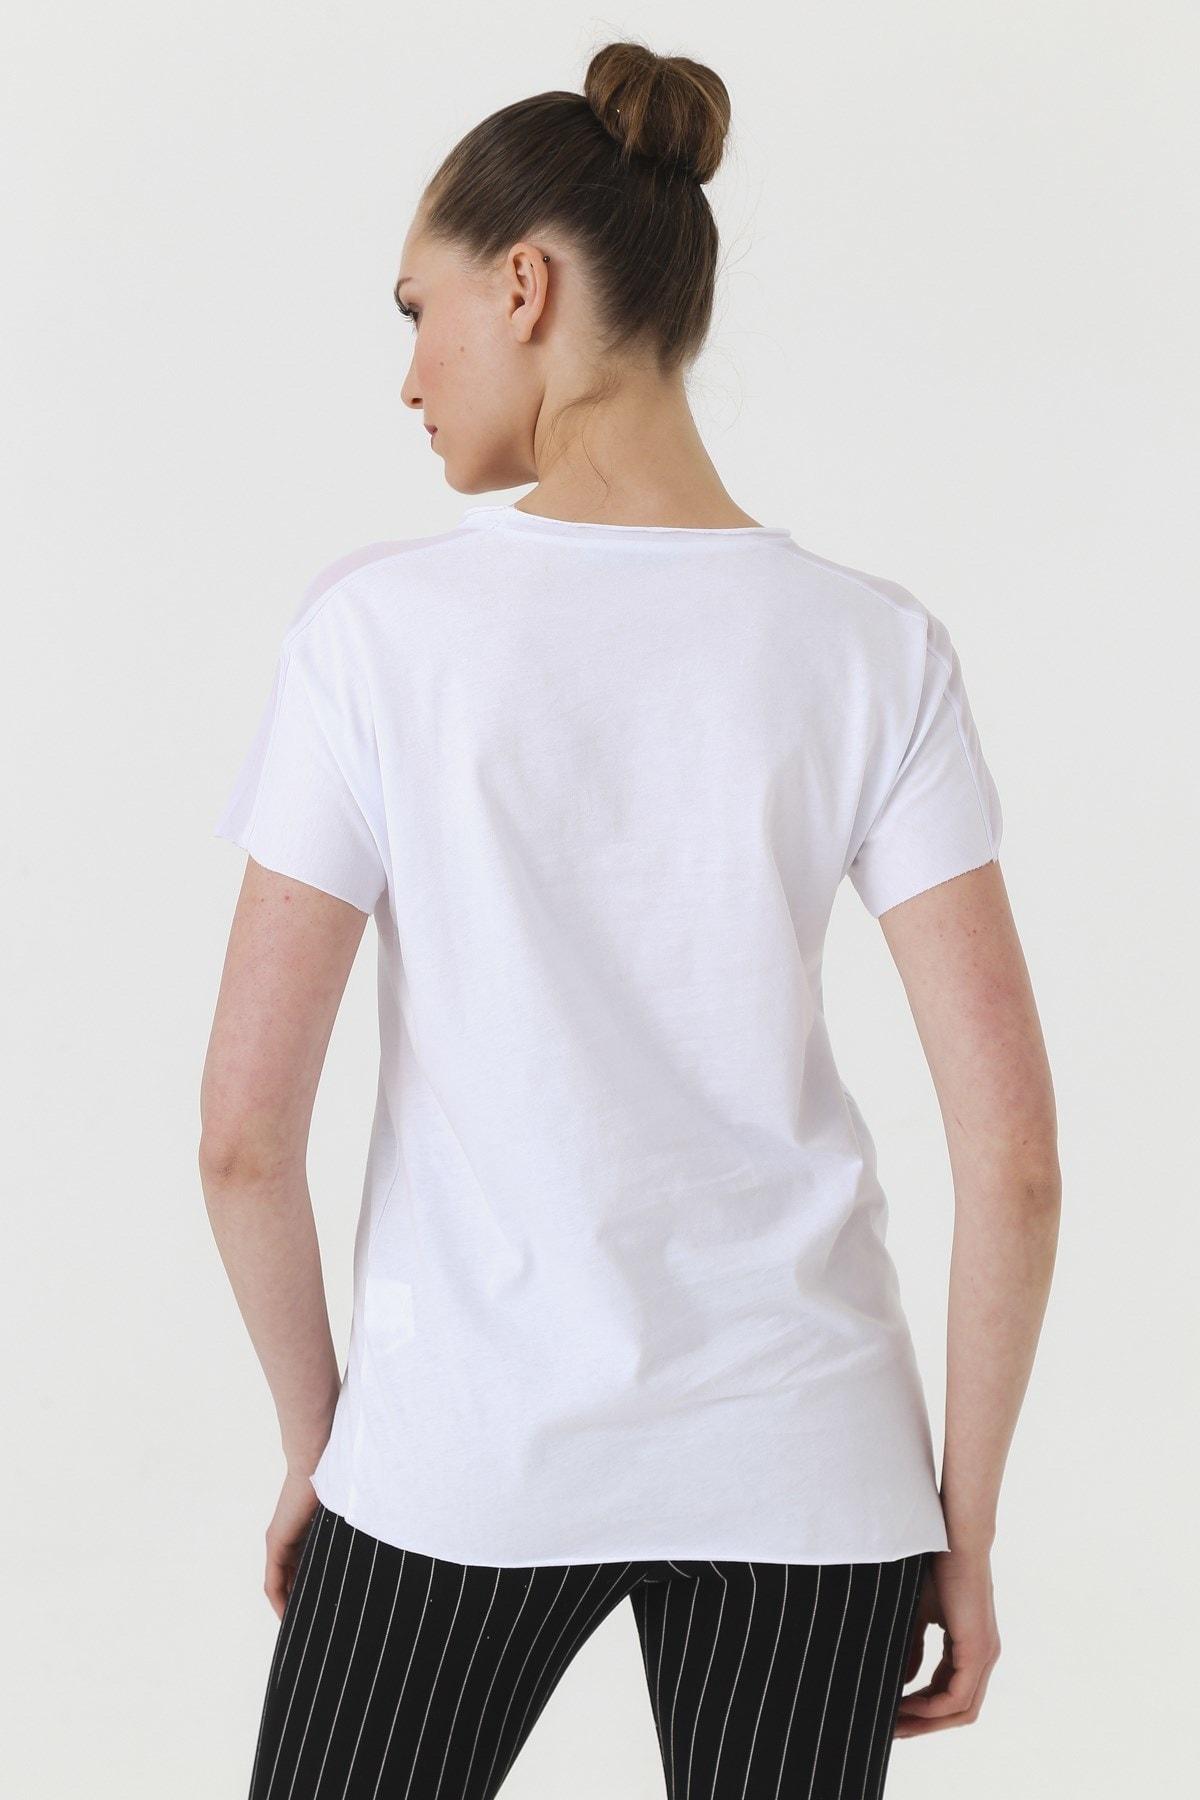 Jument Kadın Beyaz T-shirt 7095 2